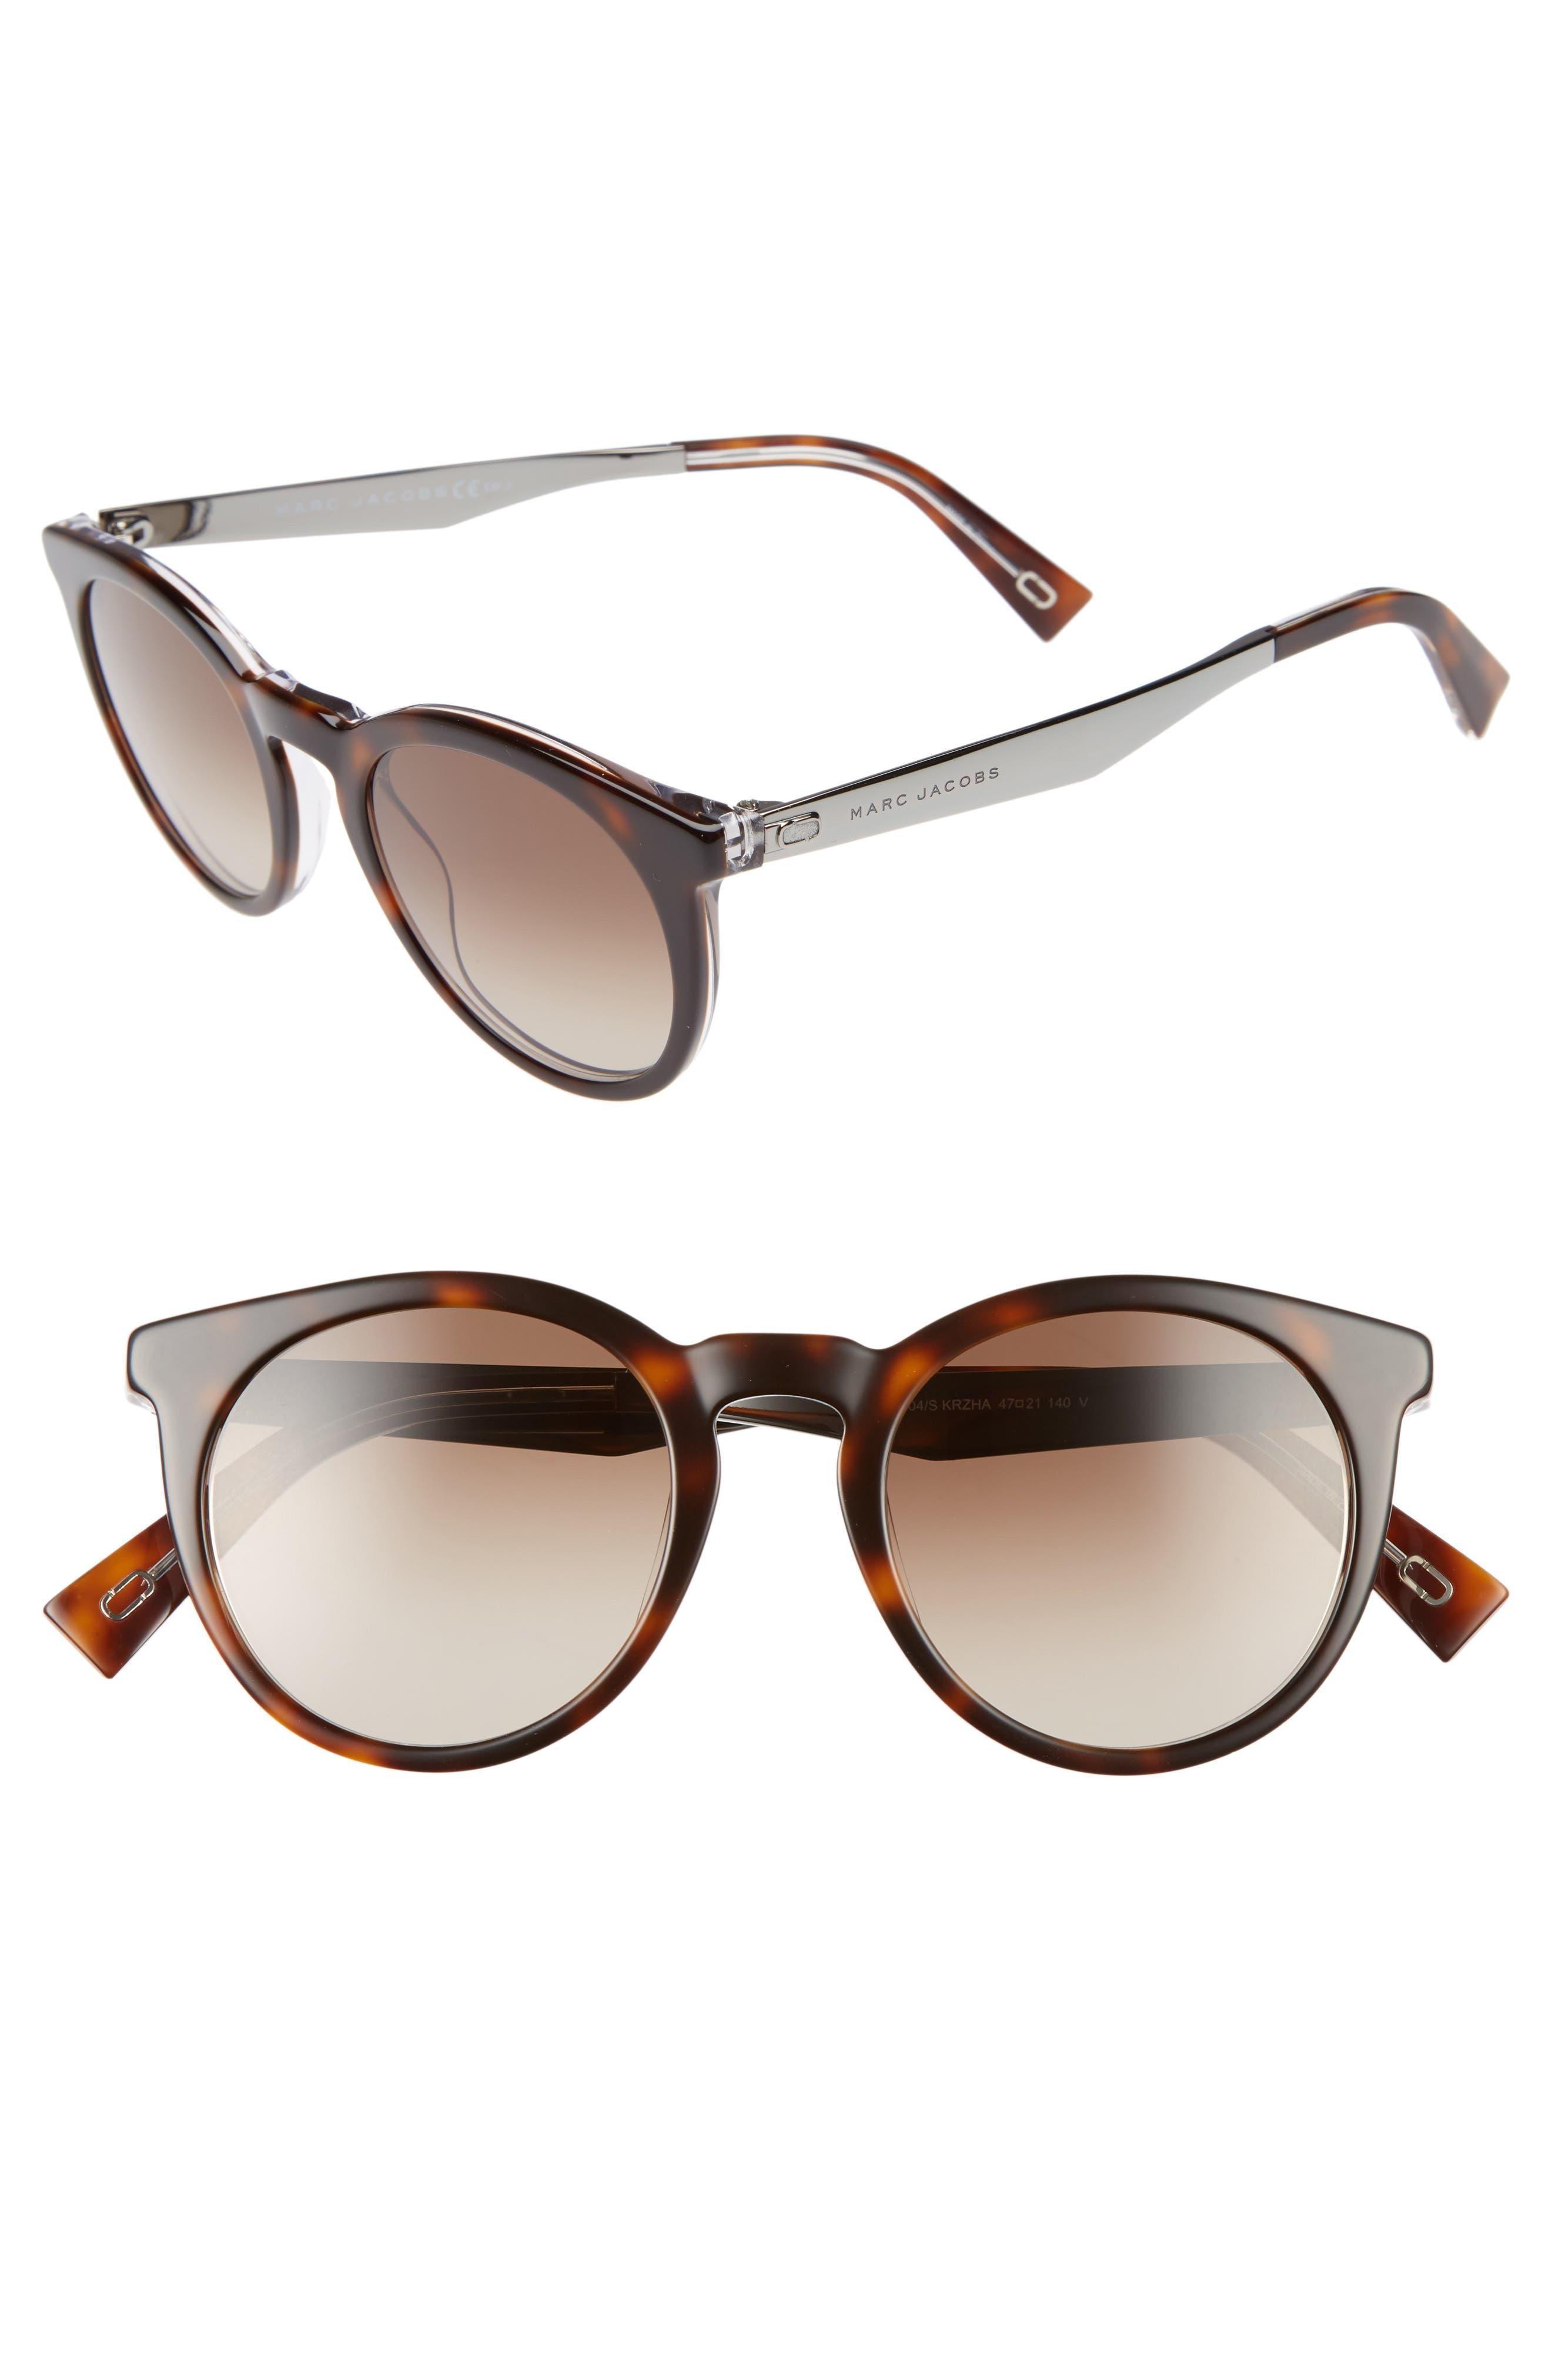 47mm Keyhole Sunglasses,                             Main thumbnail 1, color,                             Havana Crystal